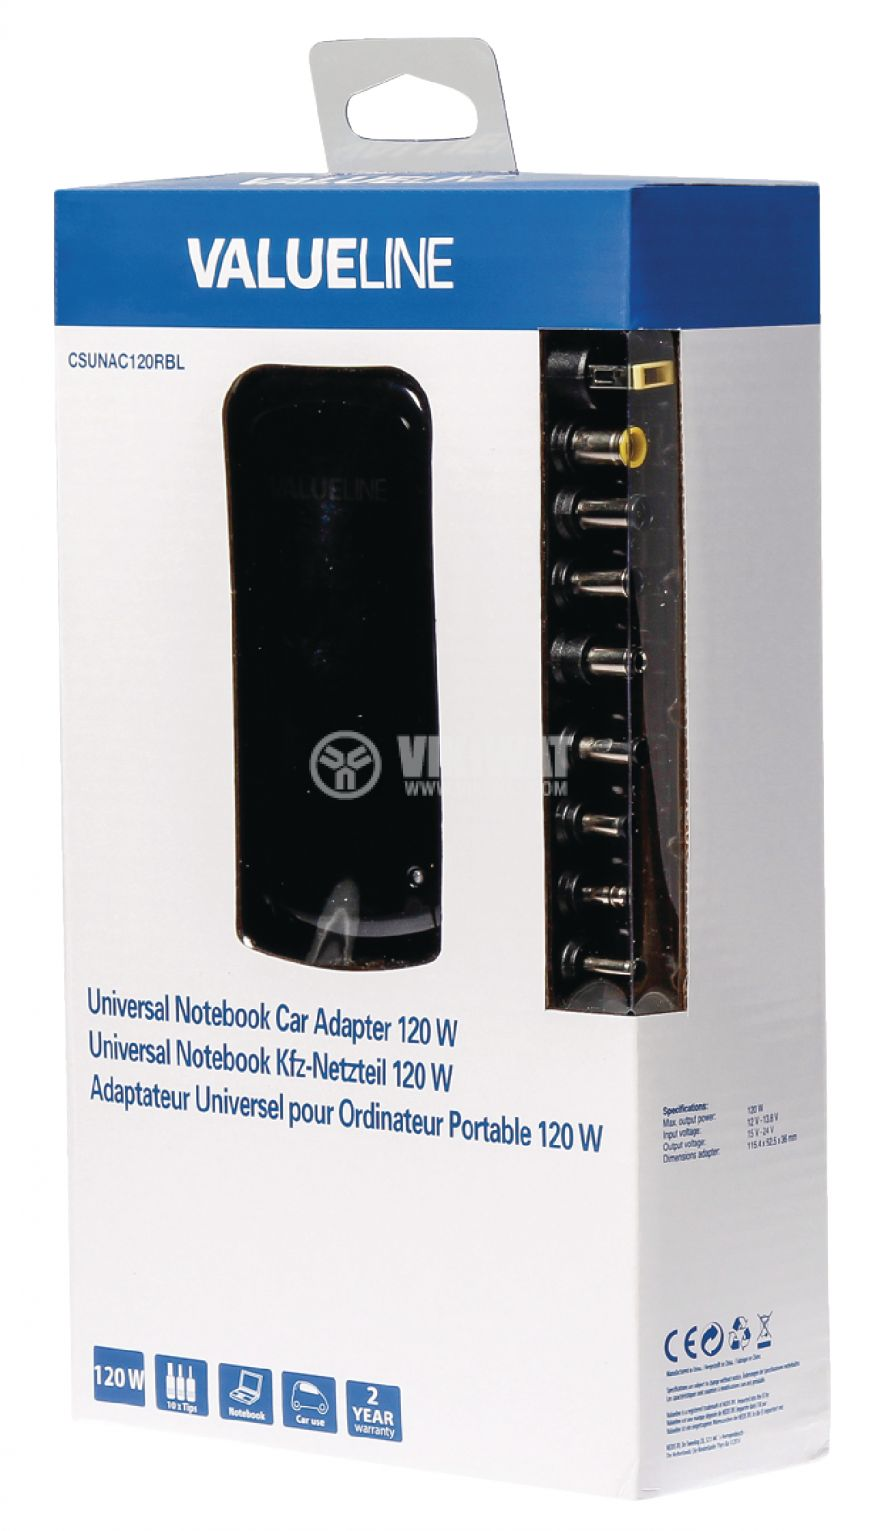 Power Adapter CSUNAC120RBL, 15/16/18/19/20/22/24 VDC, 5000 mA - 2